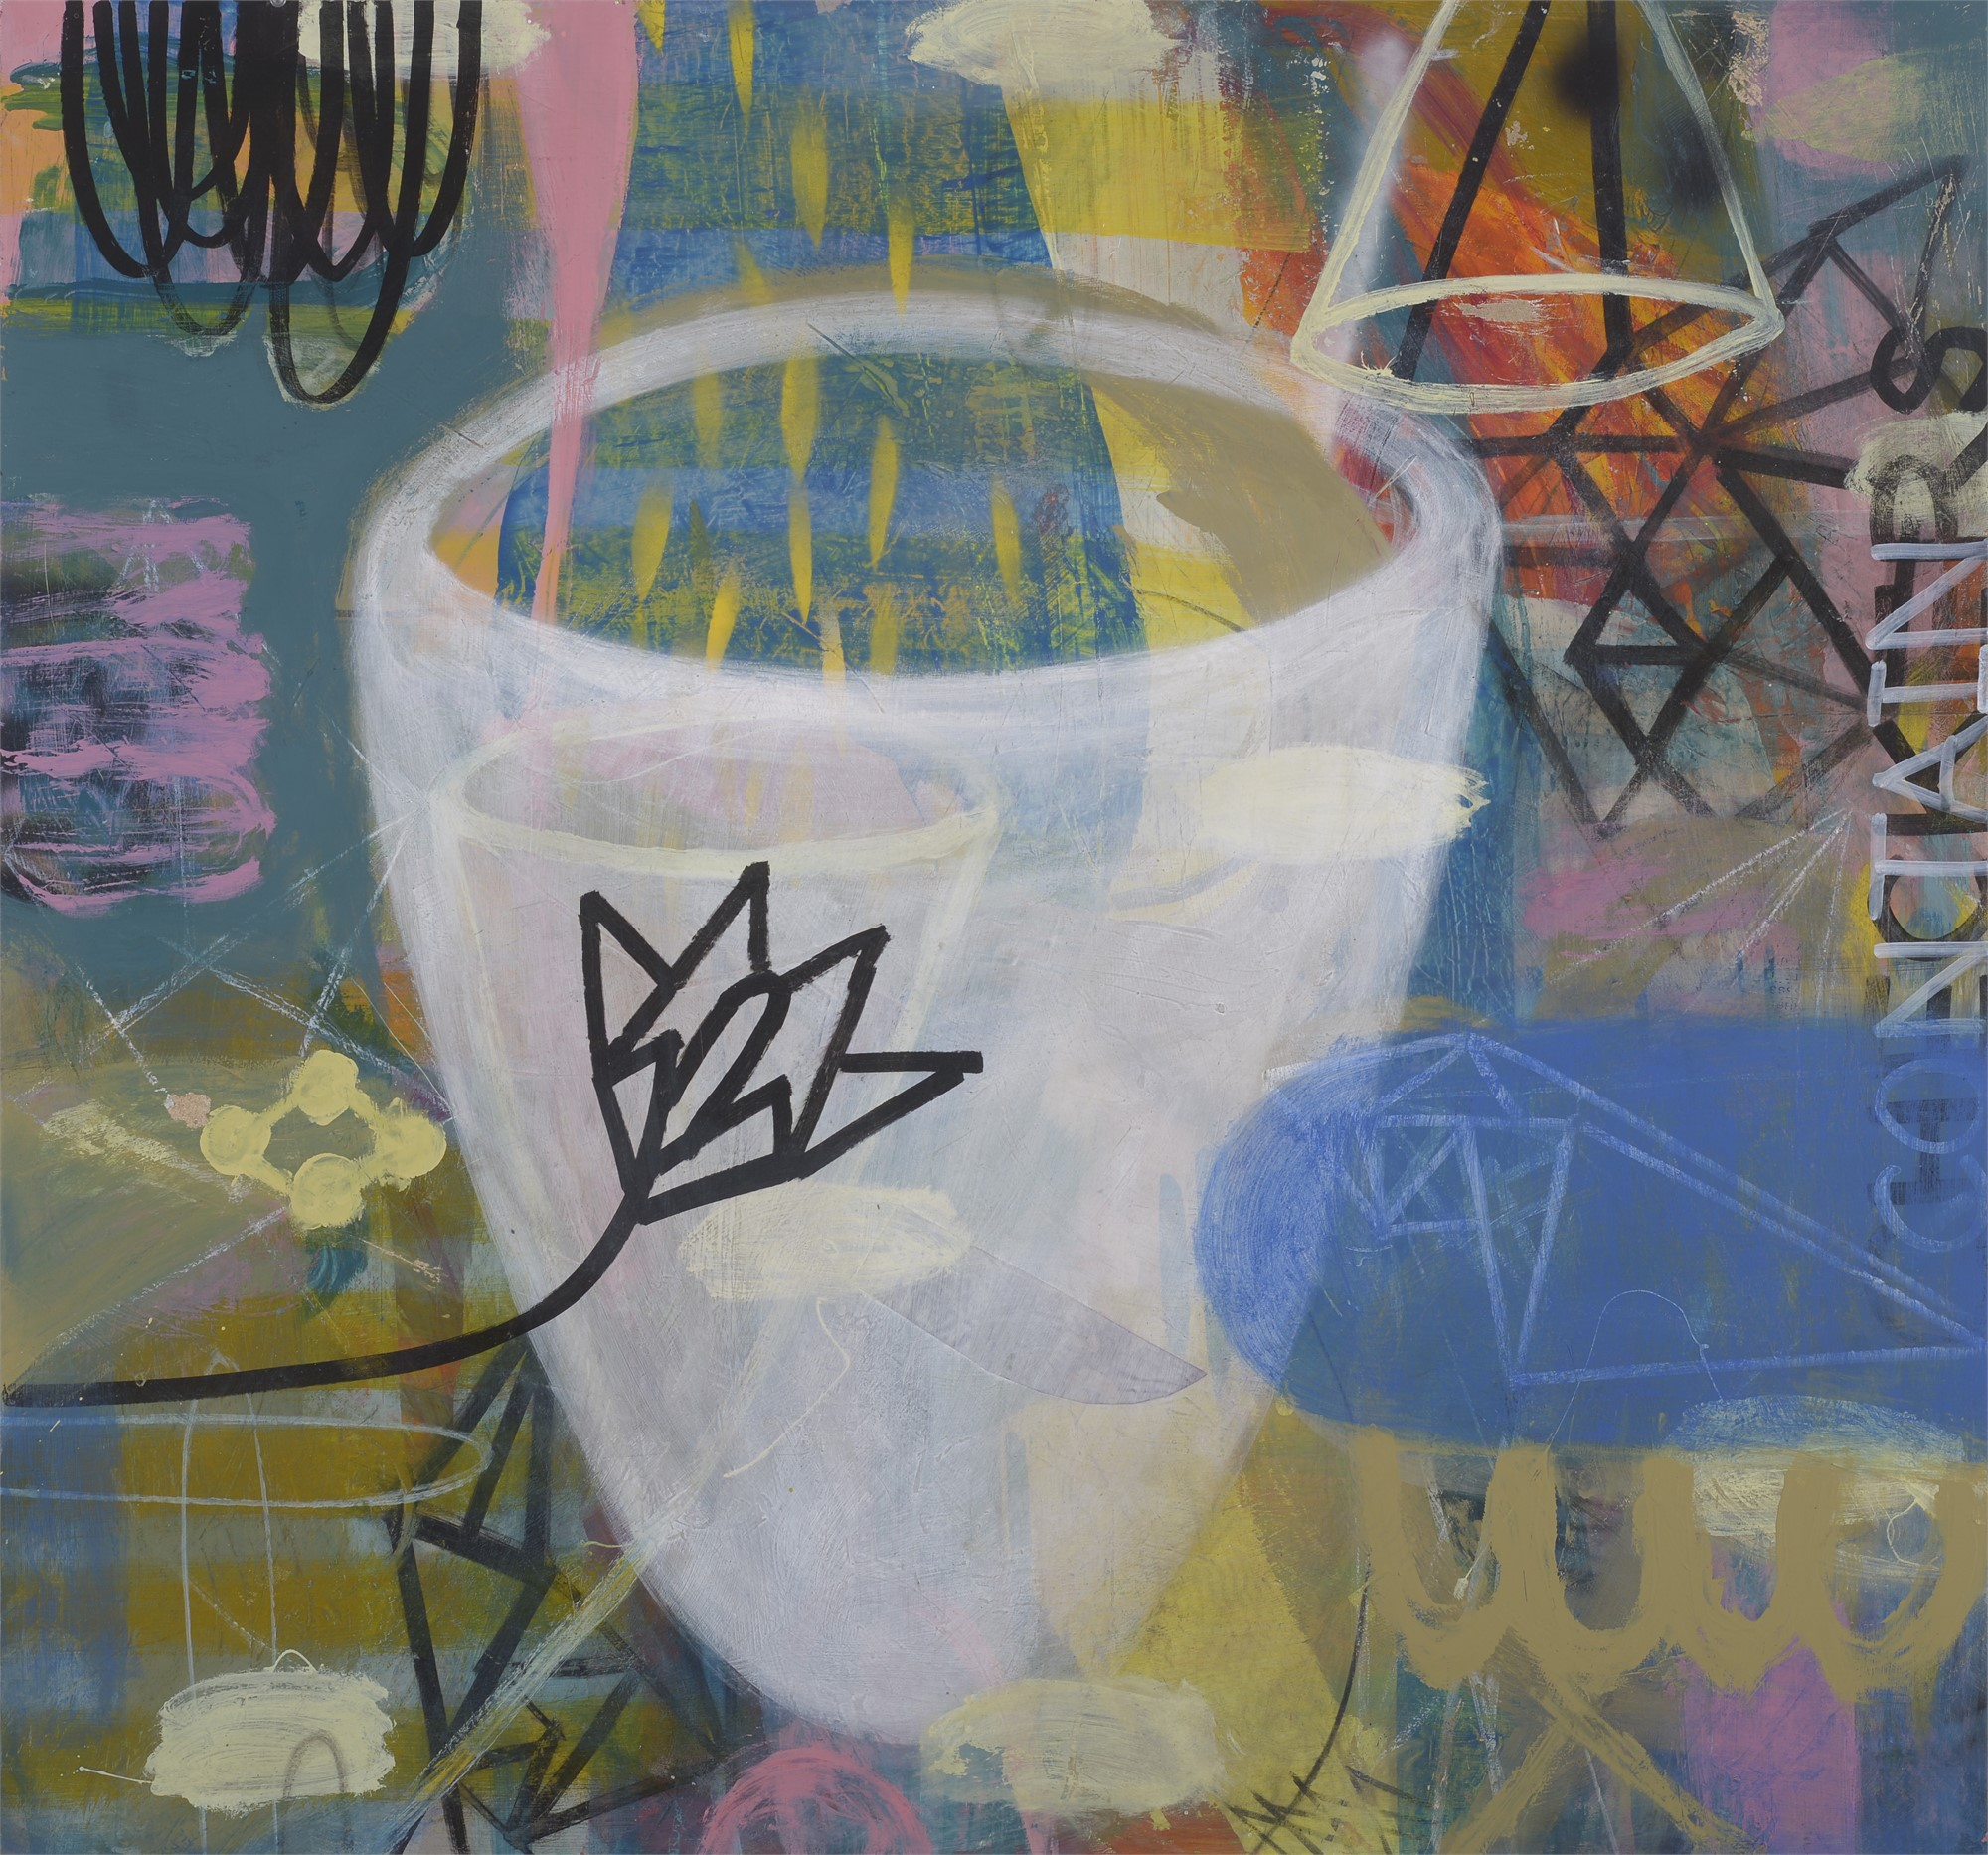 Balance Envy by Michael Gadlin